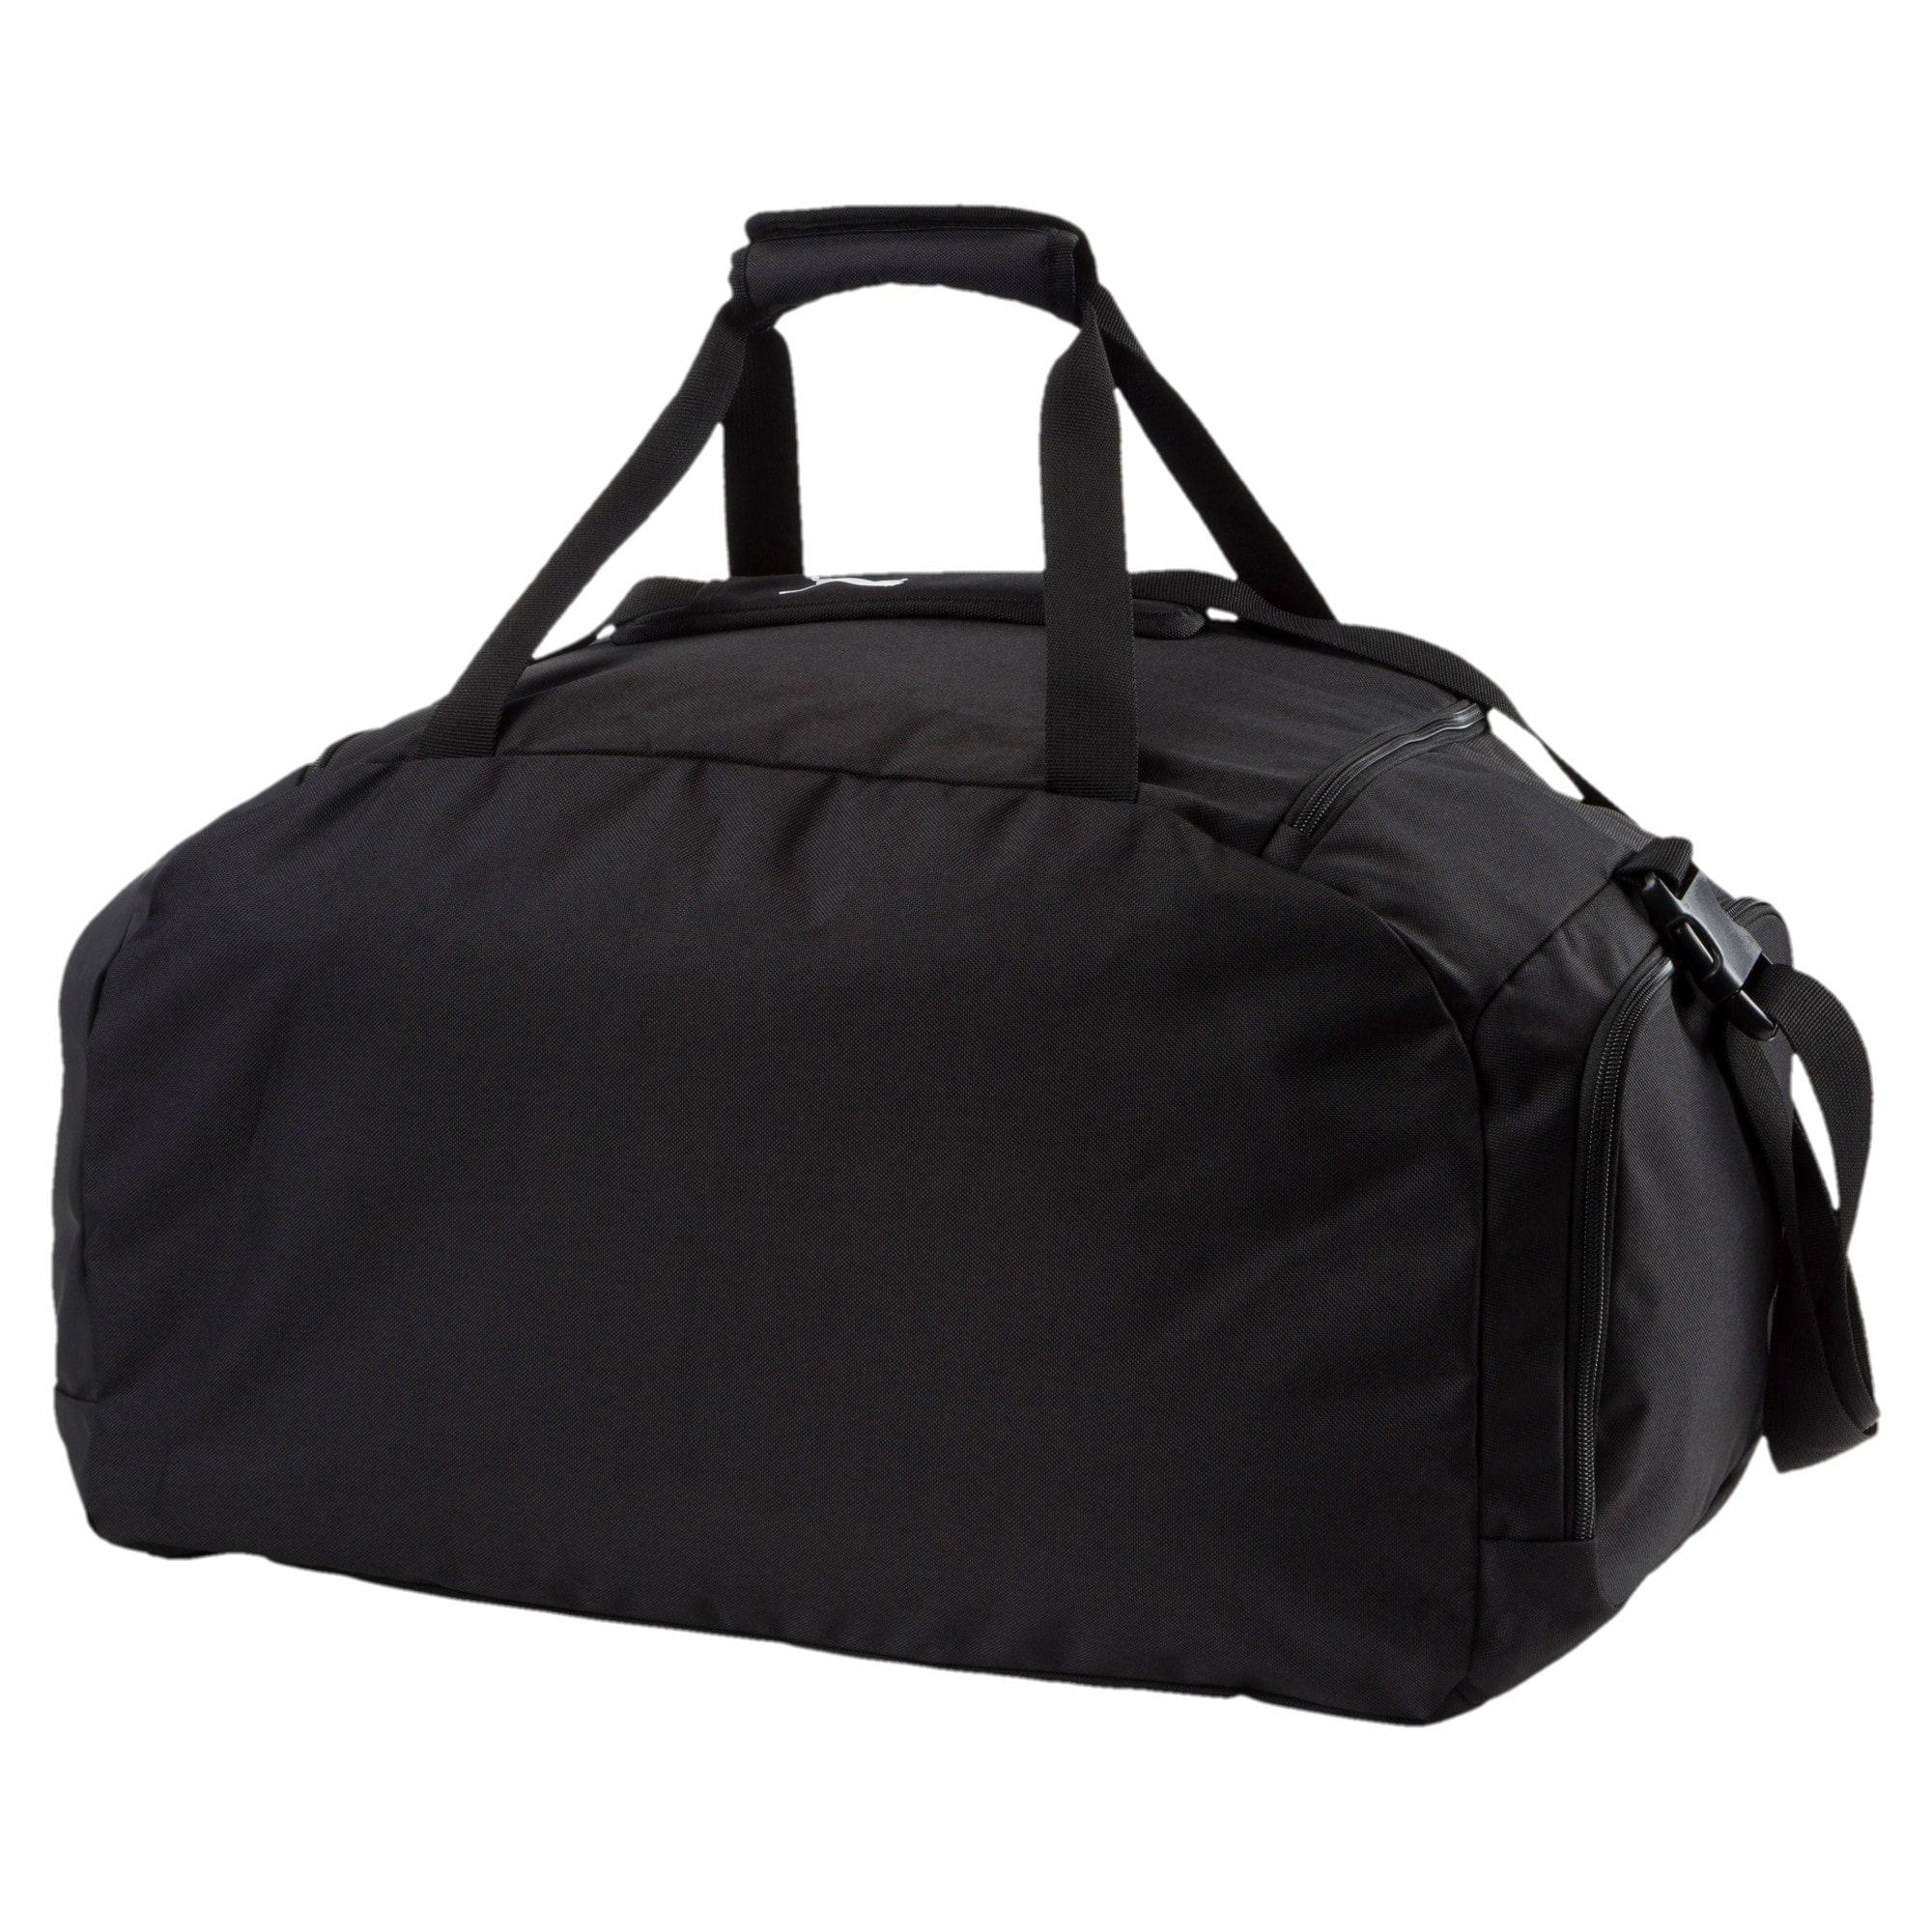 Thumbnail 2 of Liga Medium Bag, Puma Black, medium